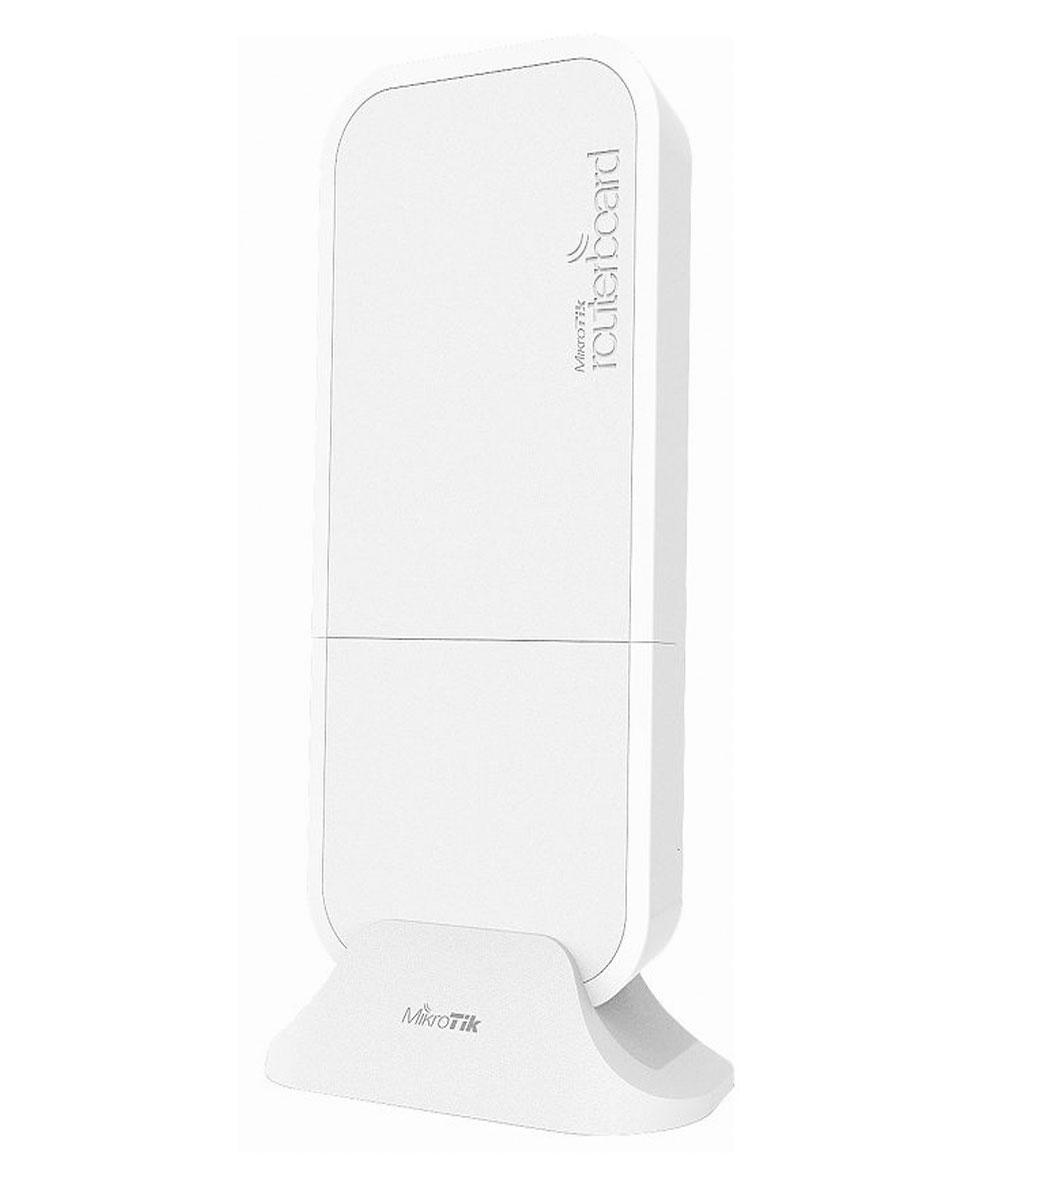 اکسس پوینت wAP LTE kit-US Mikrotik میکروتیک